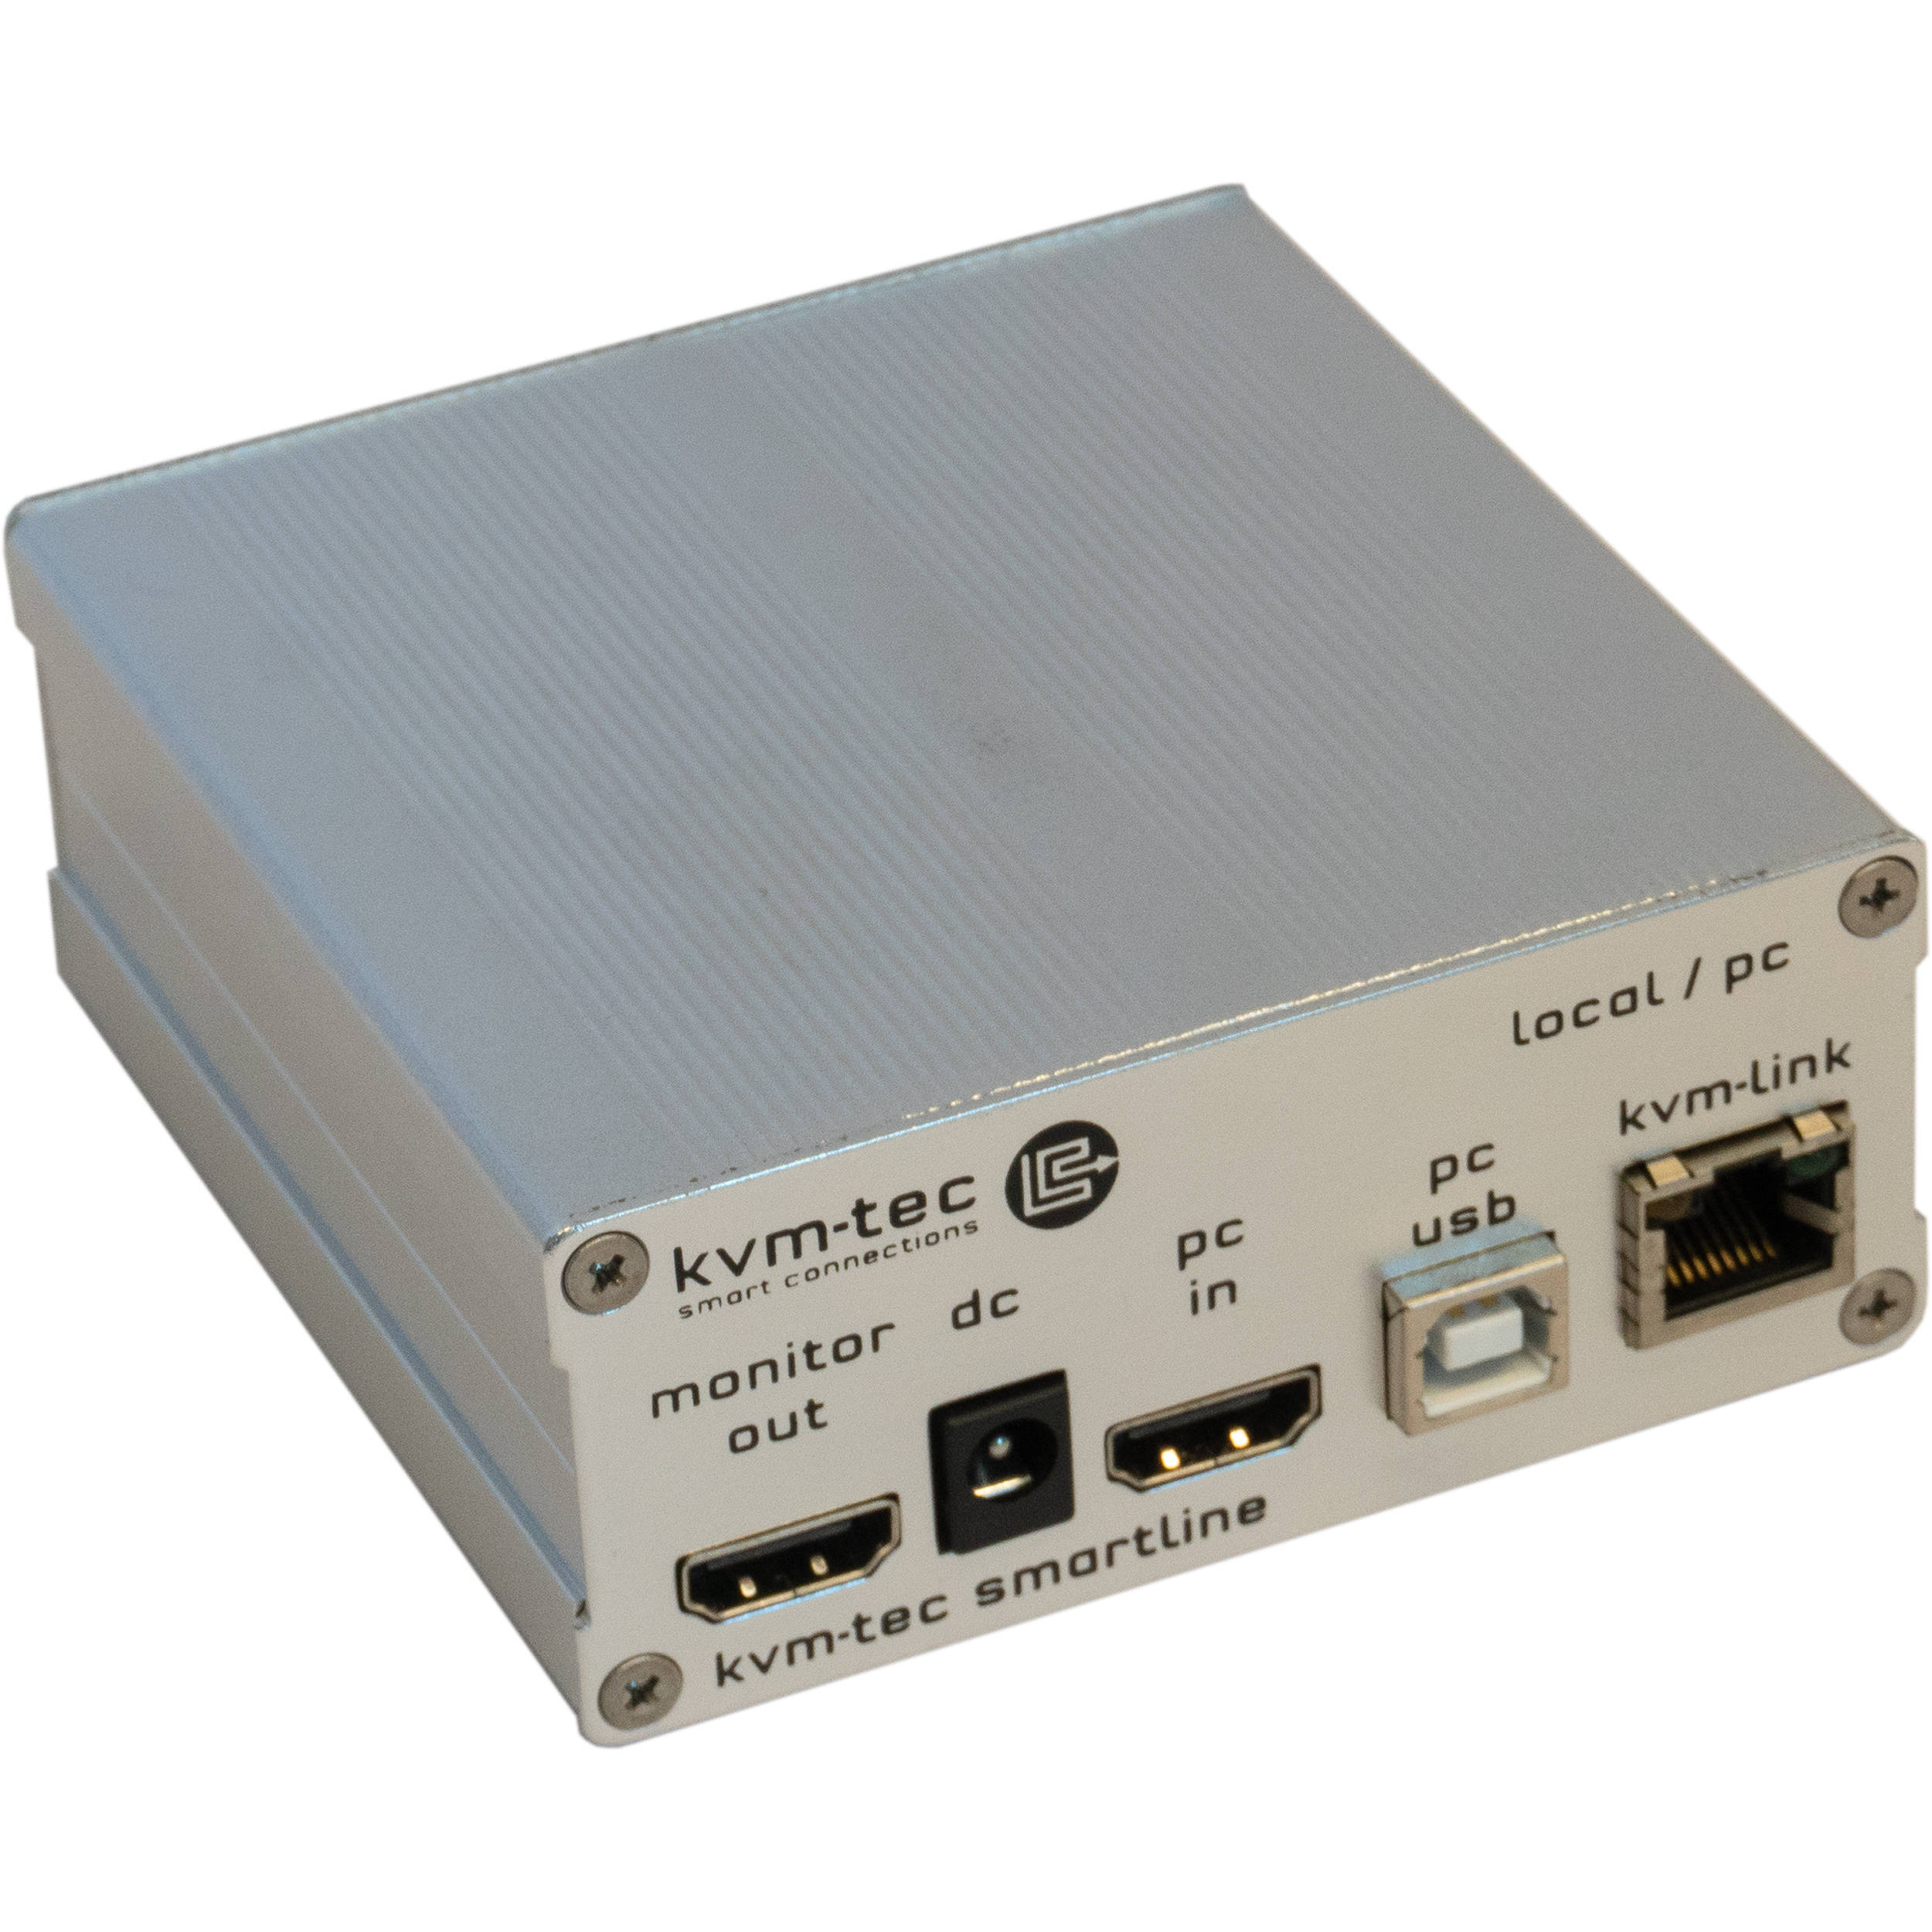 Kvm Tec 6501l Svx1l Smartline Single Extender 1435900 Jpg